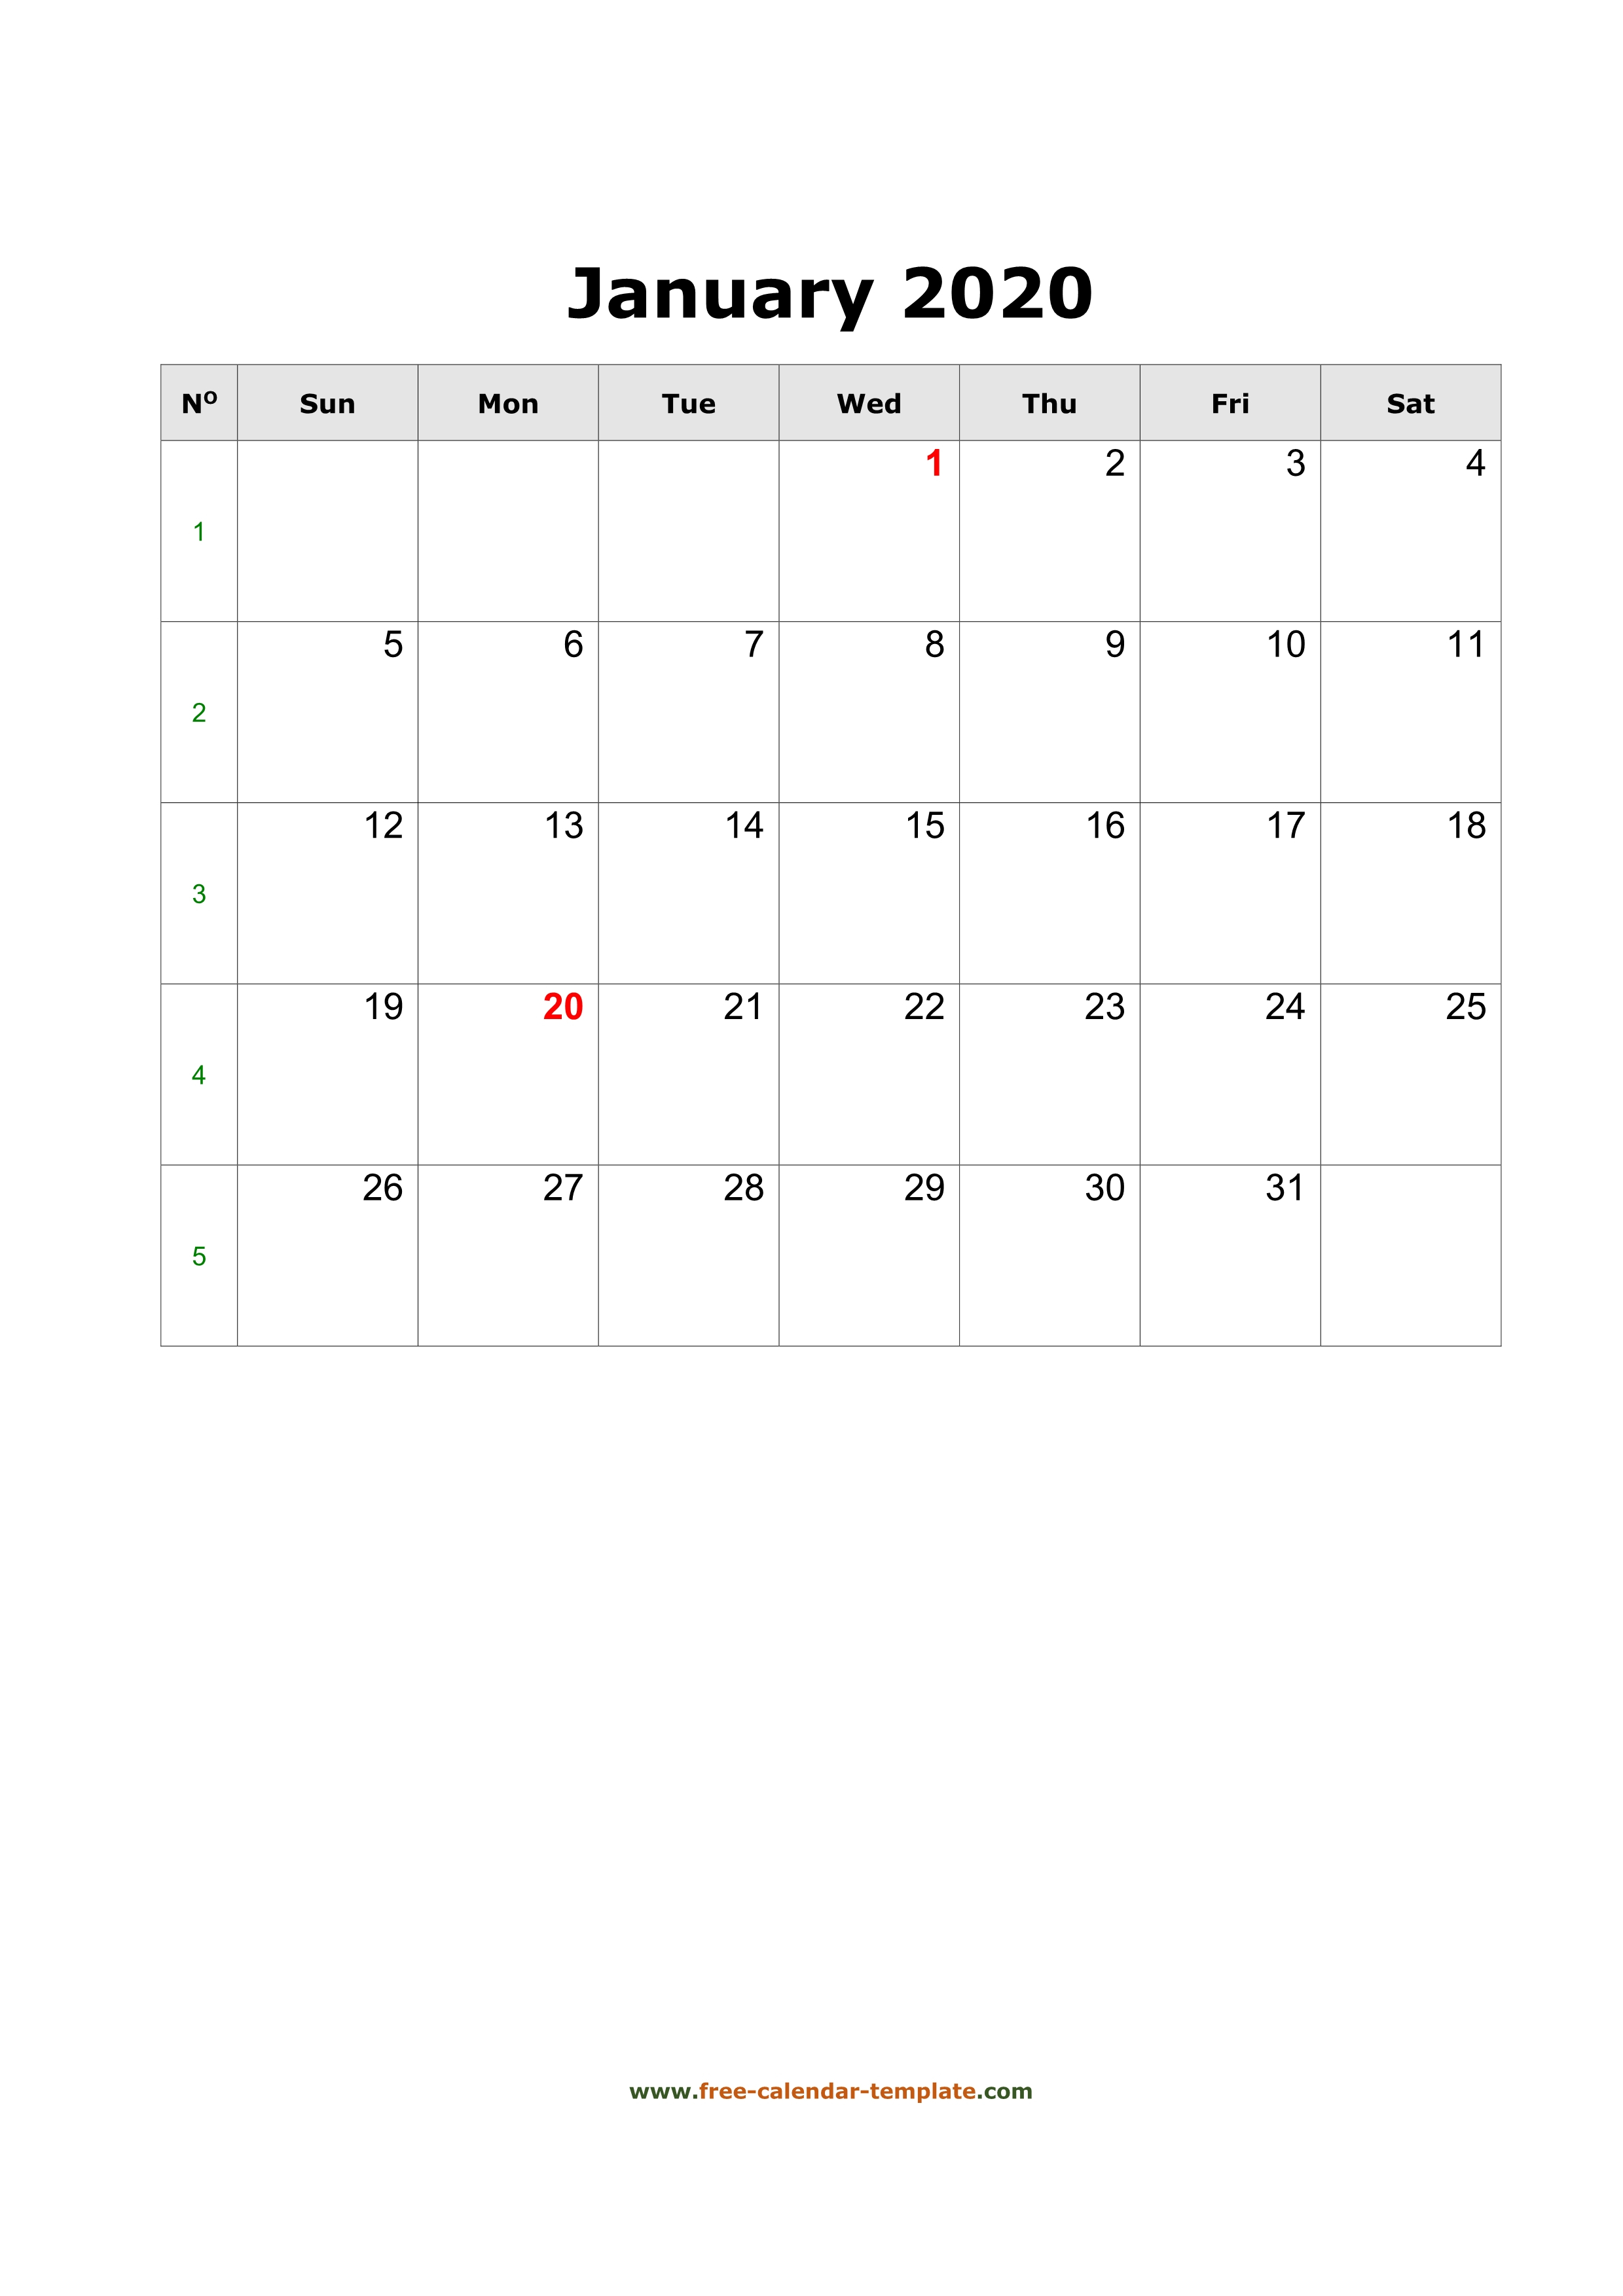 January 2020 Free Calendar Tempplate | Freecalendar for Word Calendar Template 2020